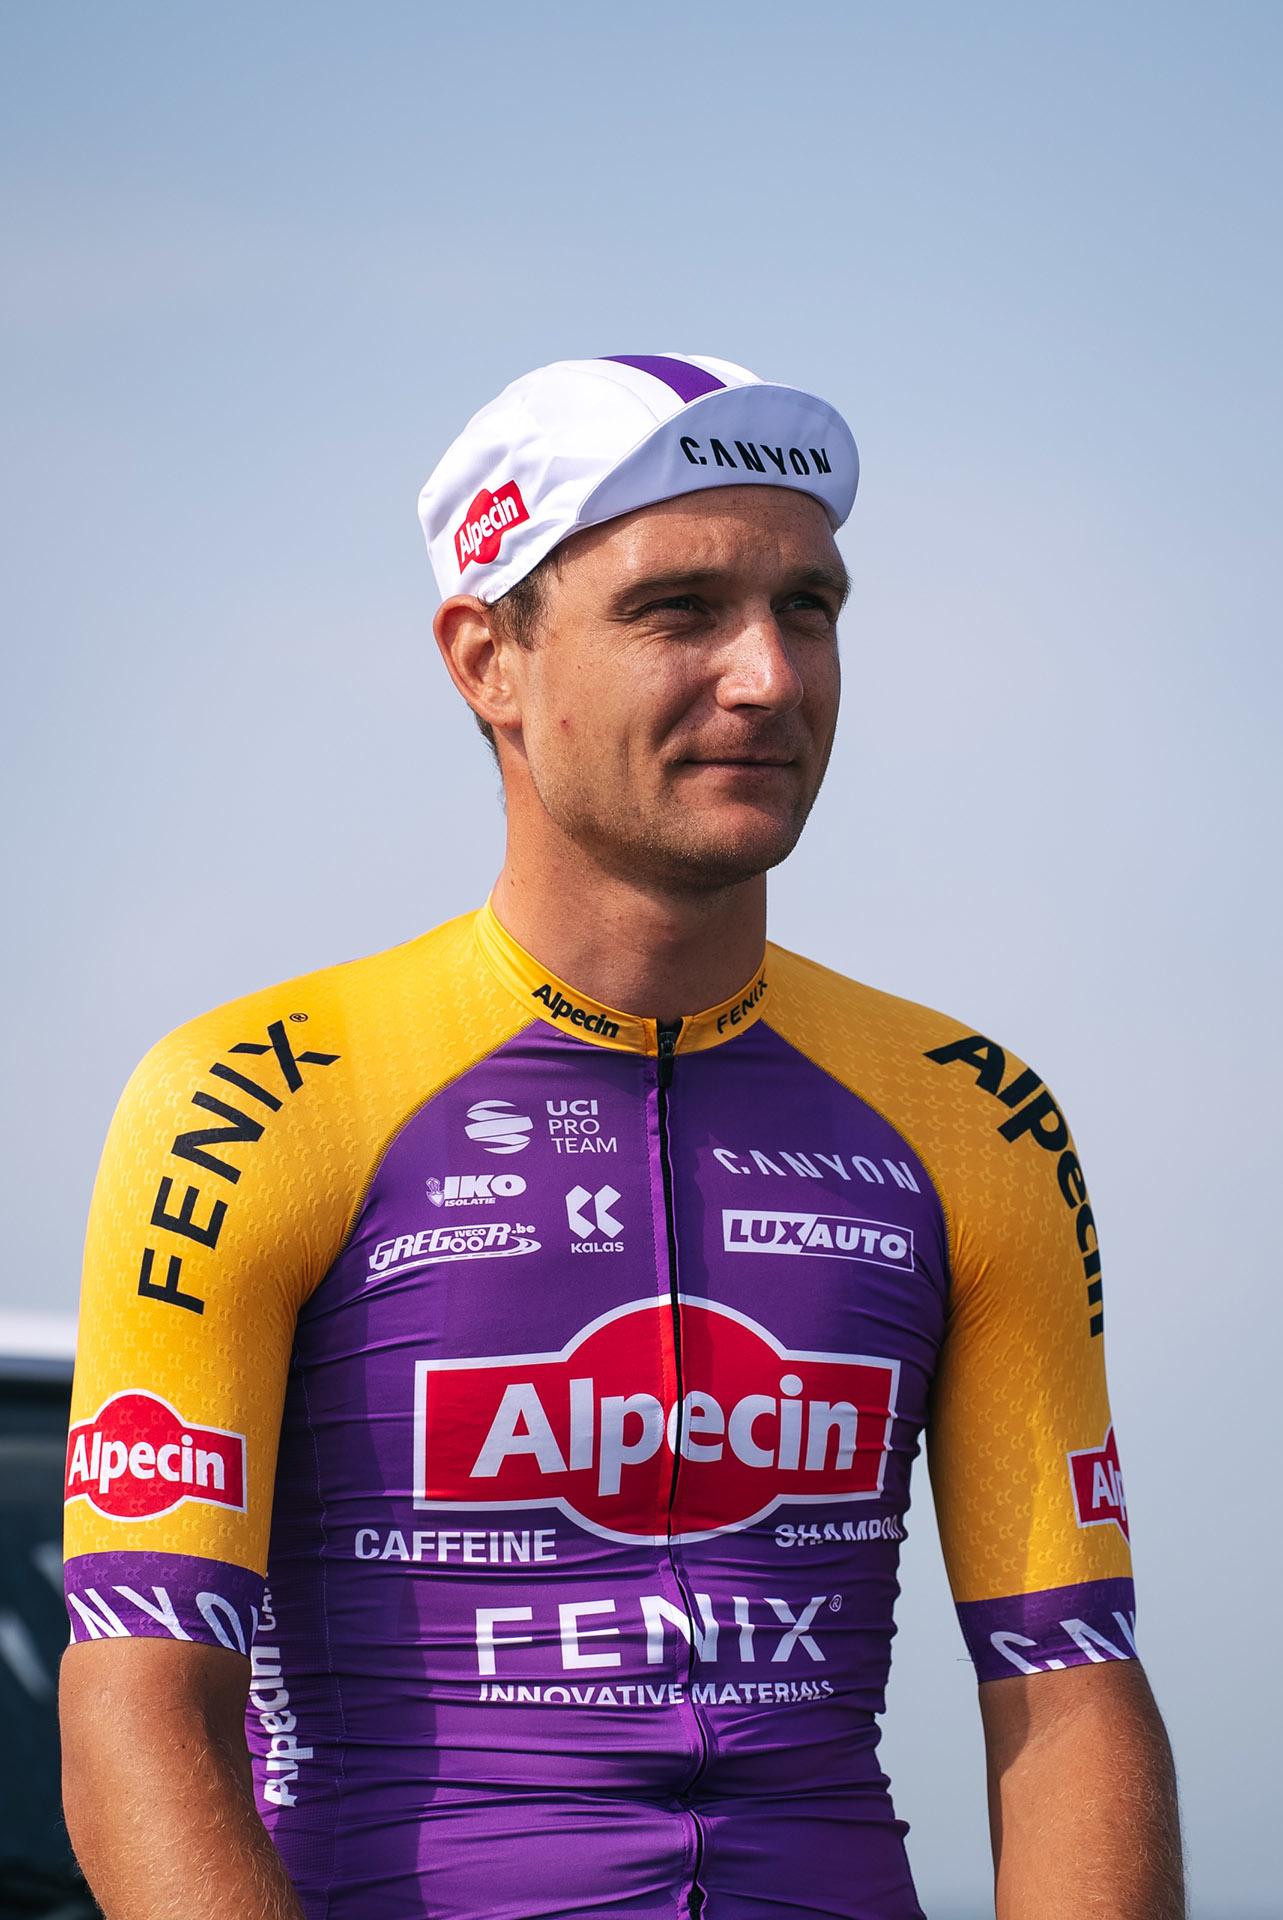 Topfanz MerciPoupou Cycling Cap